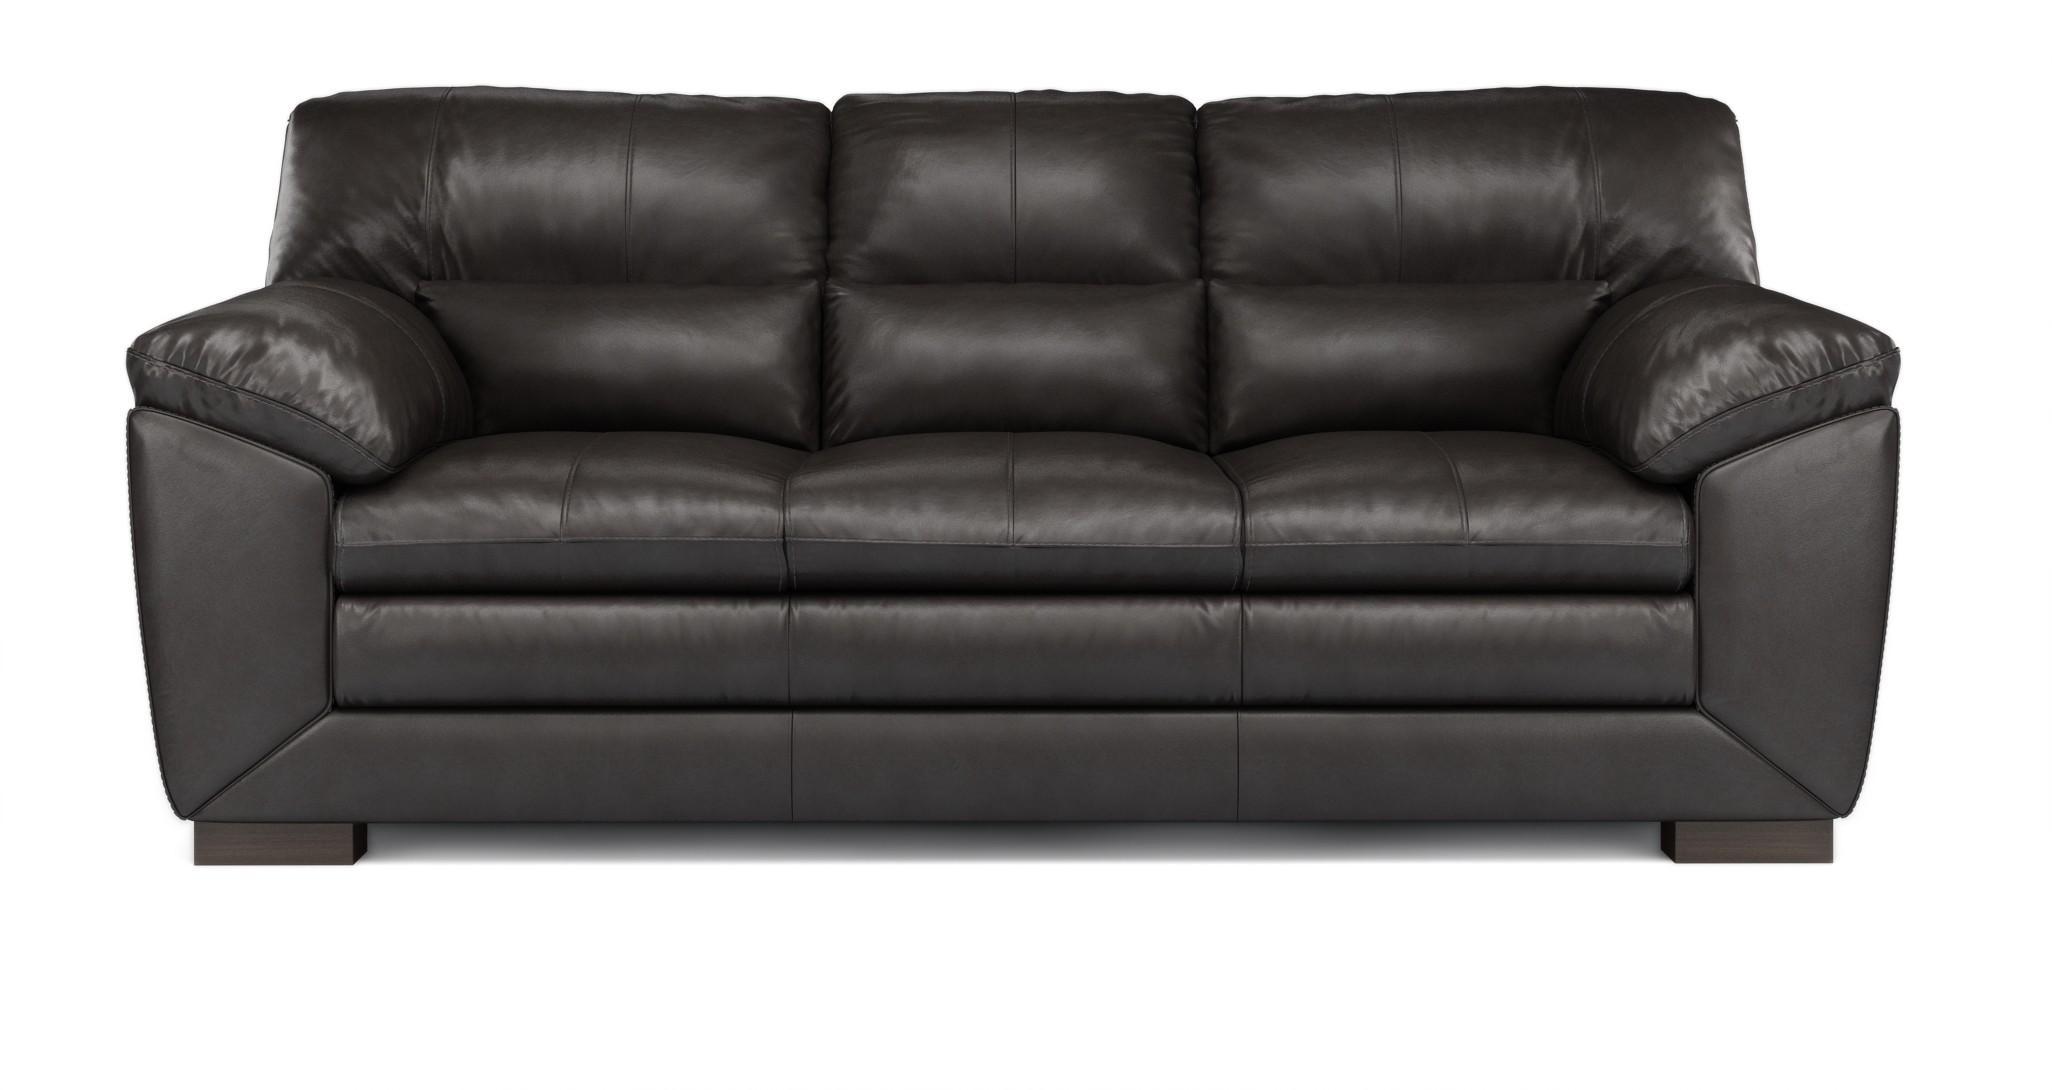 leather sofa brown dfs austin stores valiant mocha 3 seater ebay